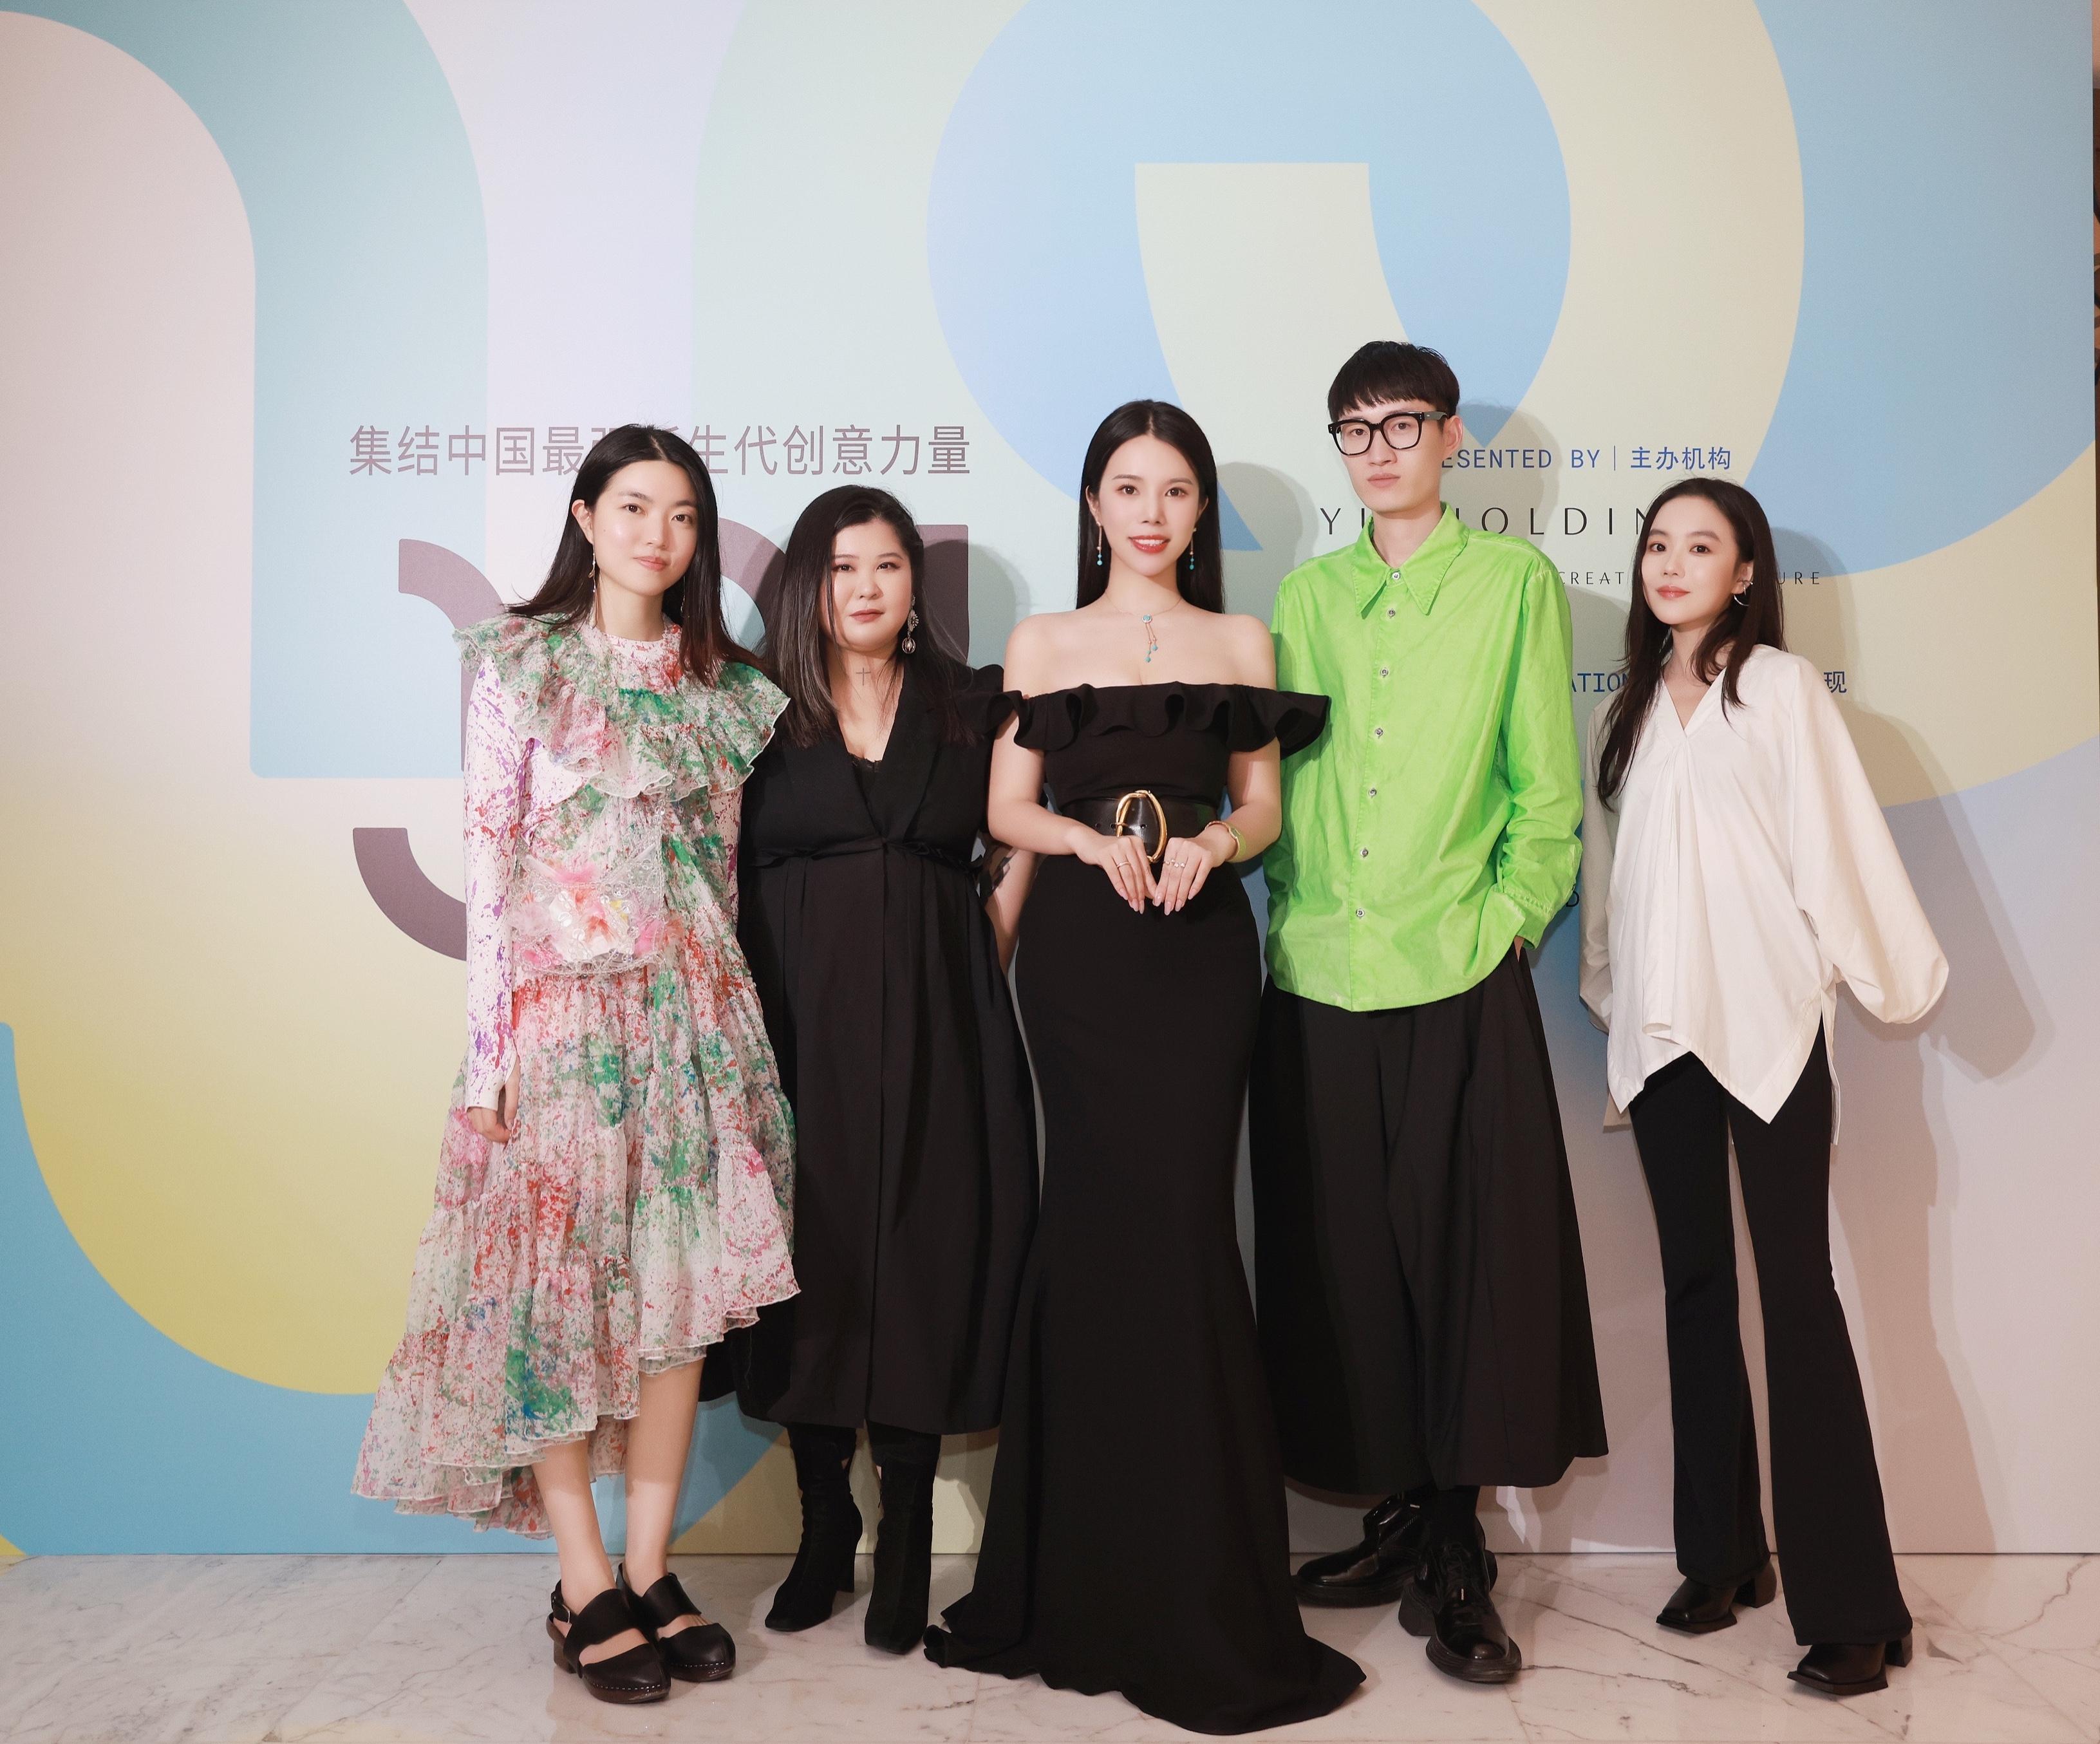 Wendy Yu (center) with the Yu Prize 2021 finalists. From left: Susan Fang, Huang Wanbing, Chen Peng, and Chen Danqi.